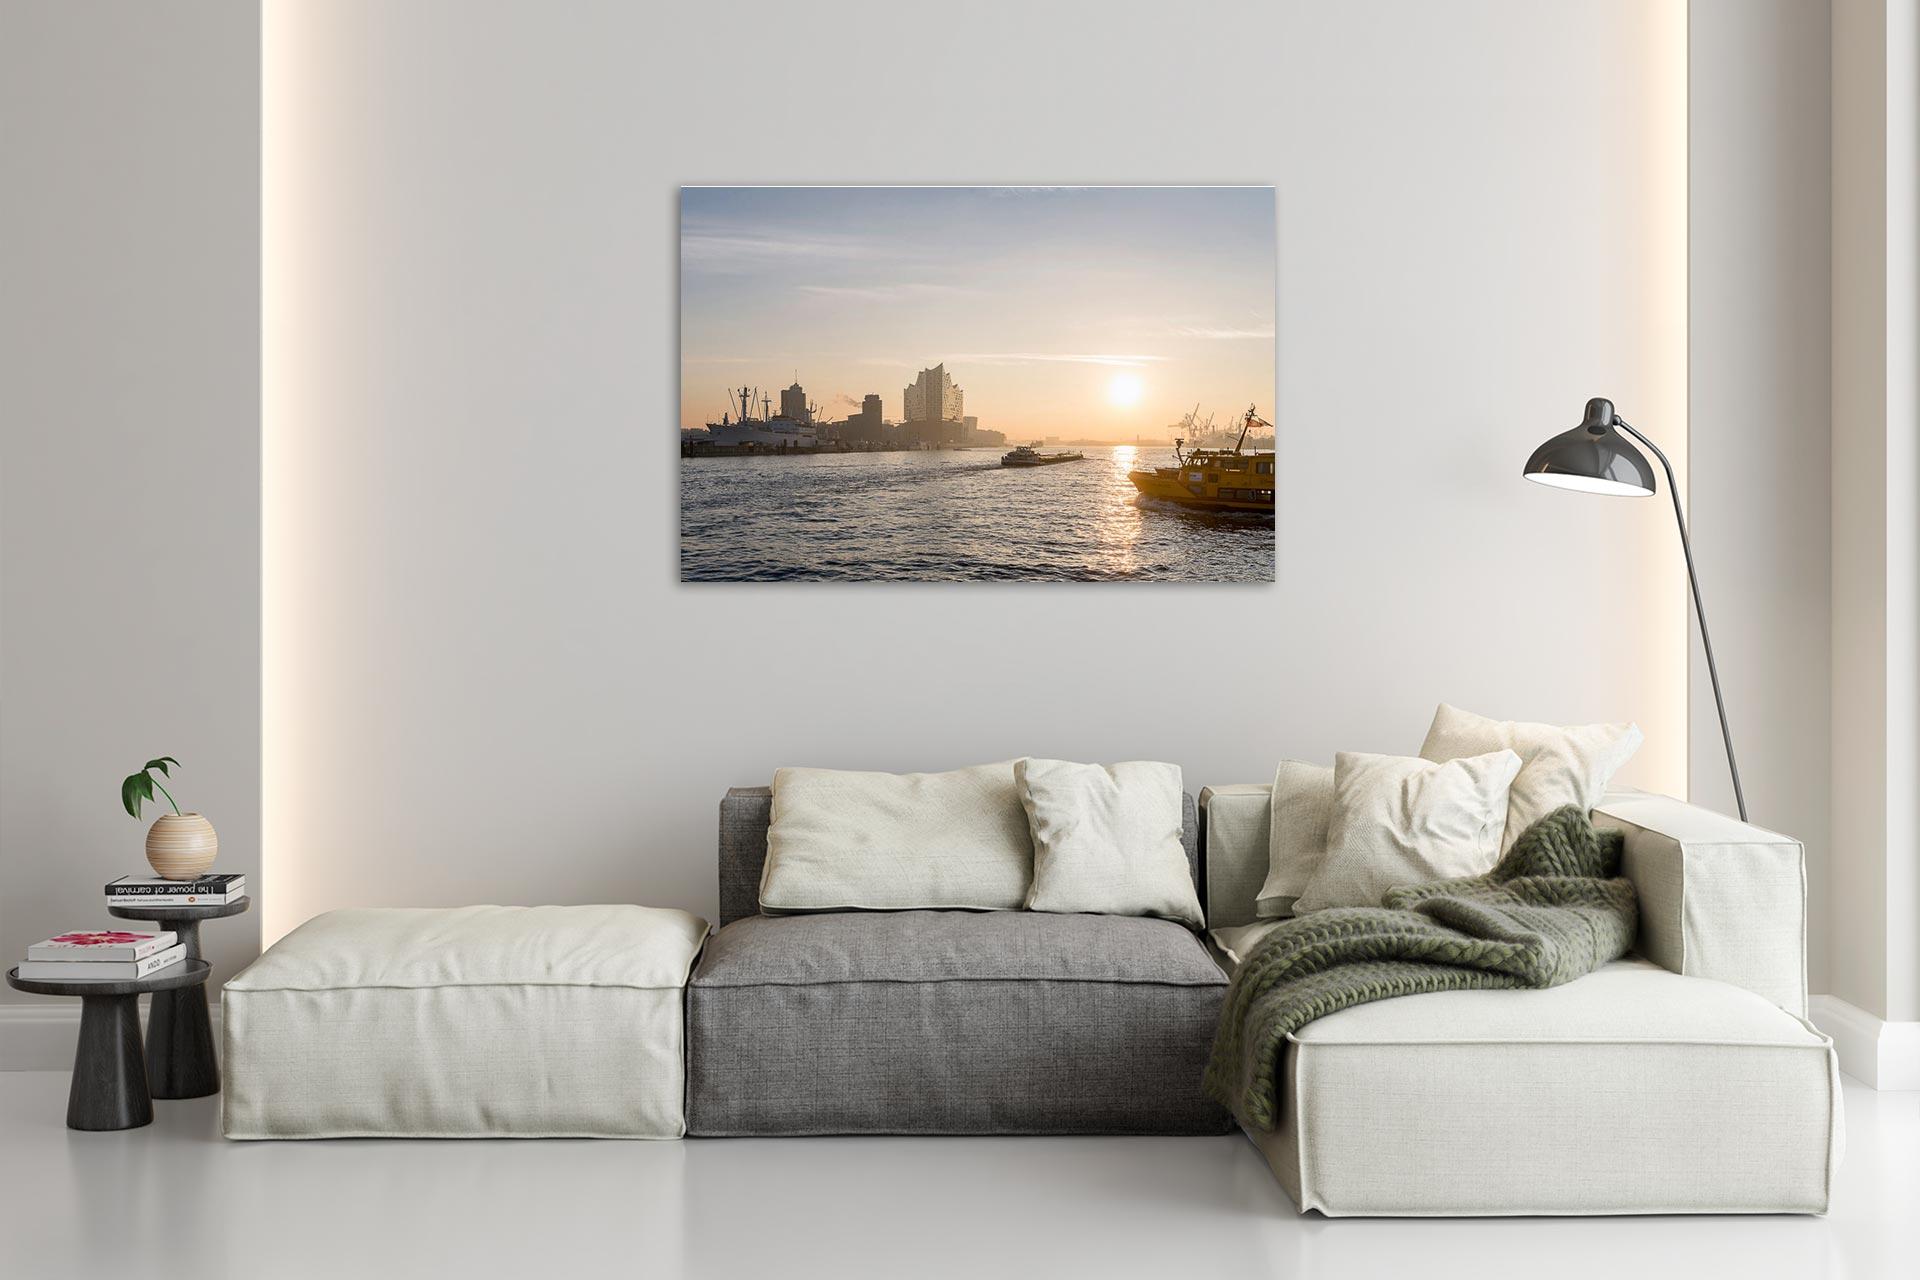 LCW287-gloria-wandbild-bild-auf-leinwand-acrylglas-aludibond-wohnzimmer